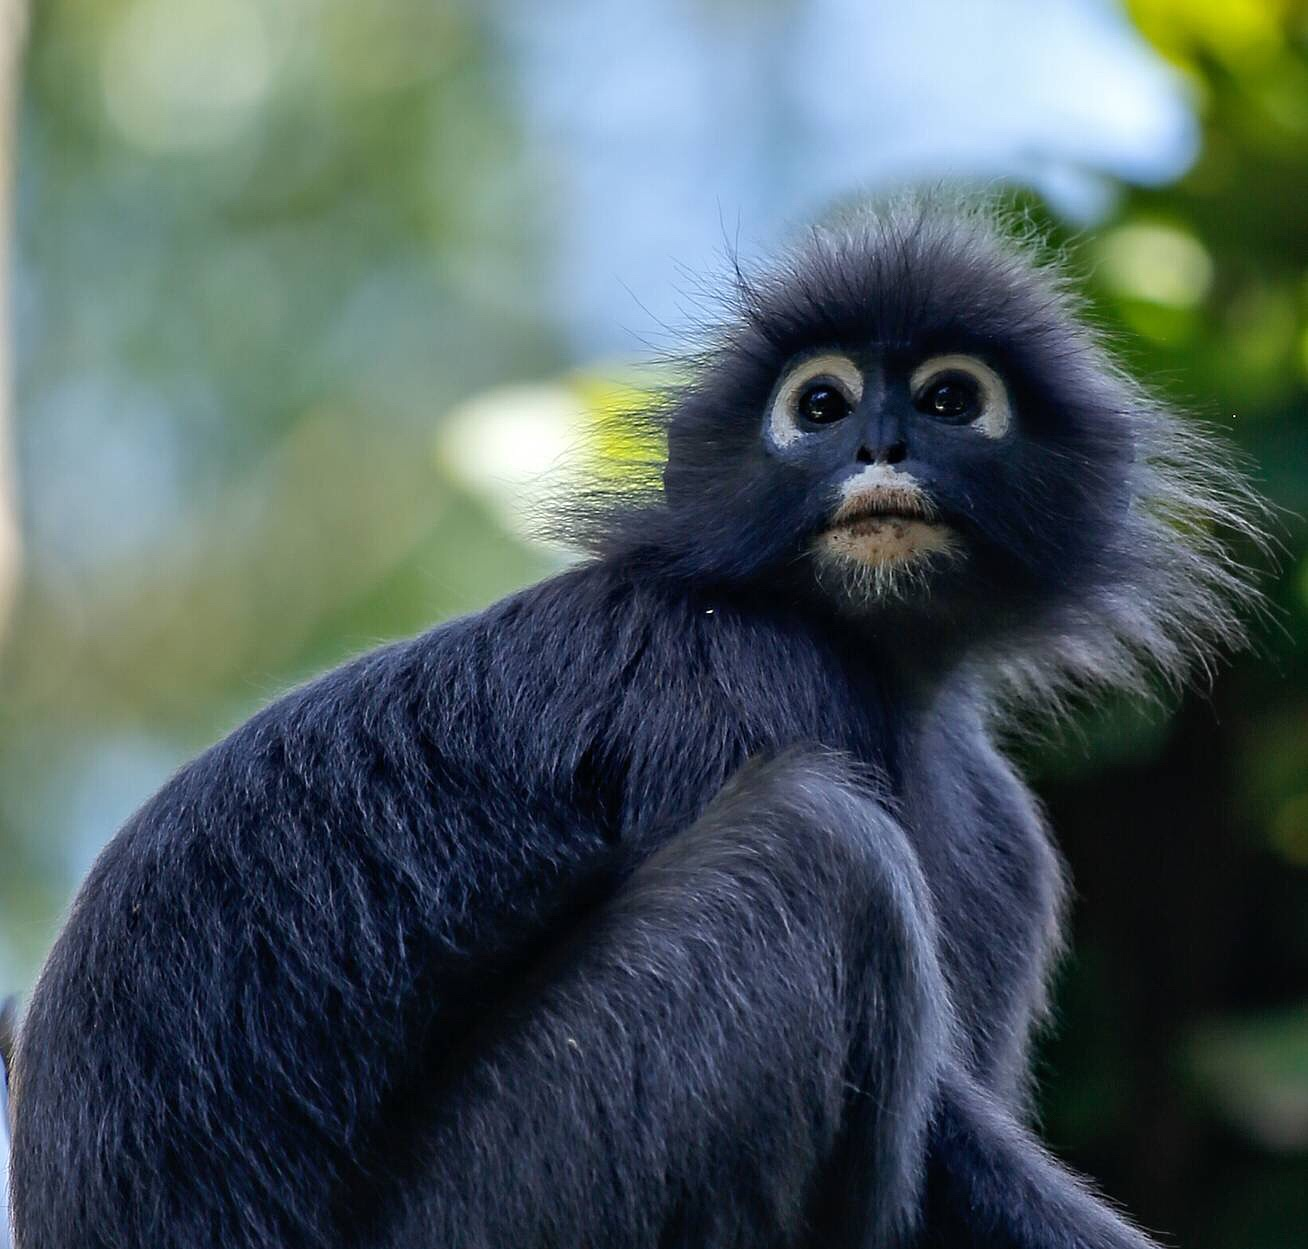 Monkeybusiness by Ruudjieboy